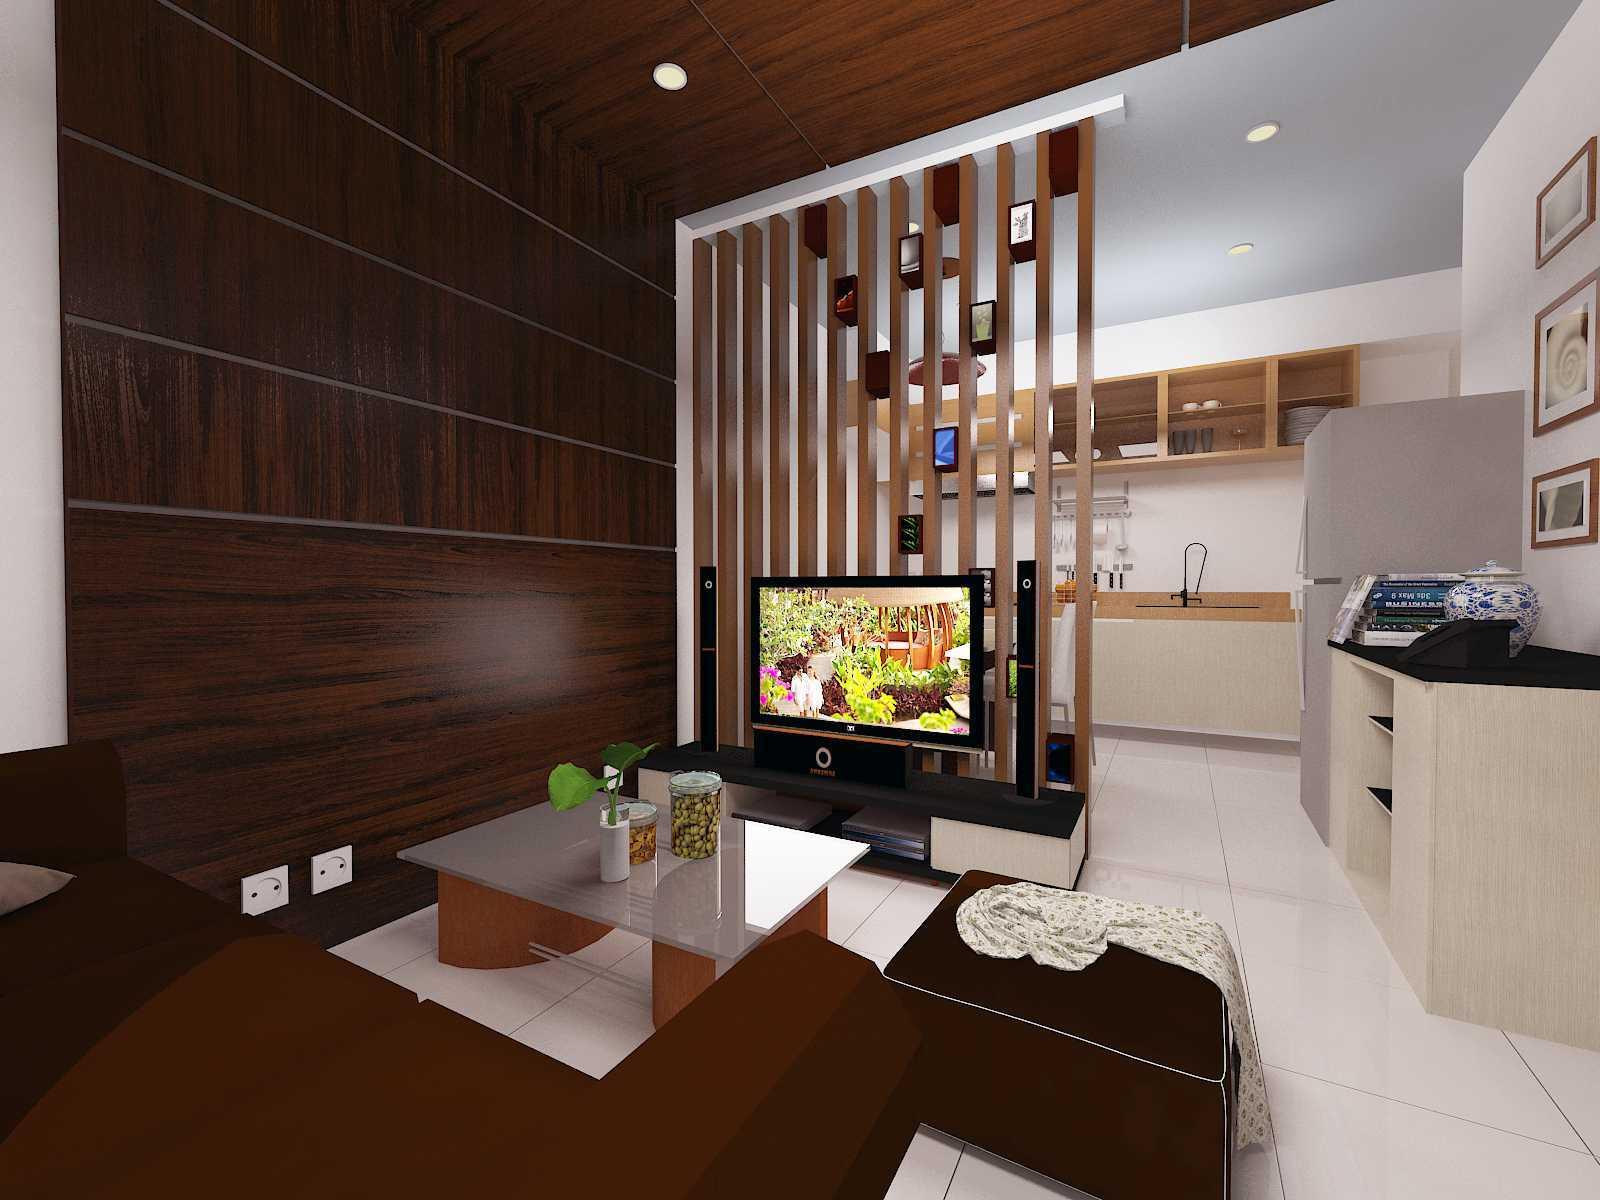 Archdesignbuild7 Project Town House  Jatimekar Jatimekar Livingroom Minimalis  13533